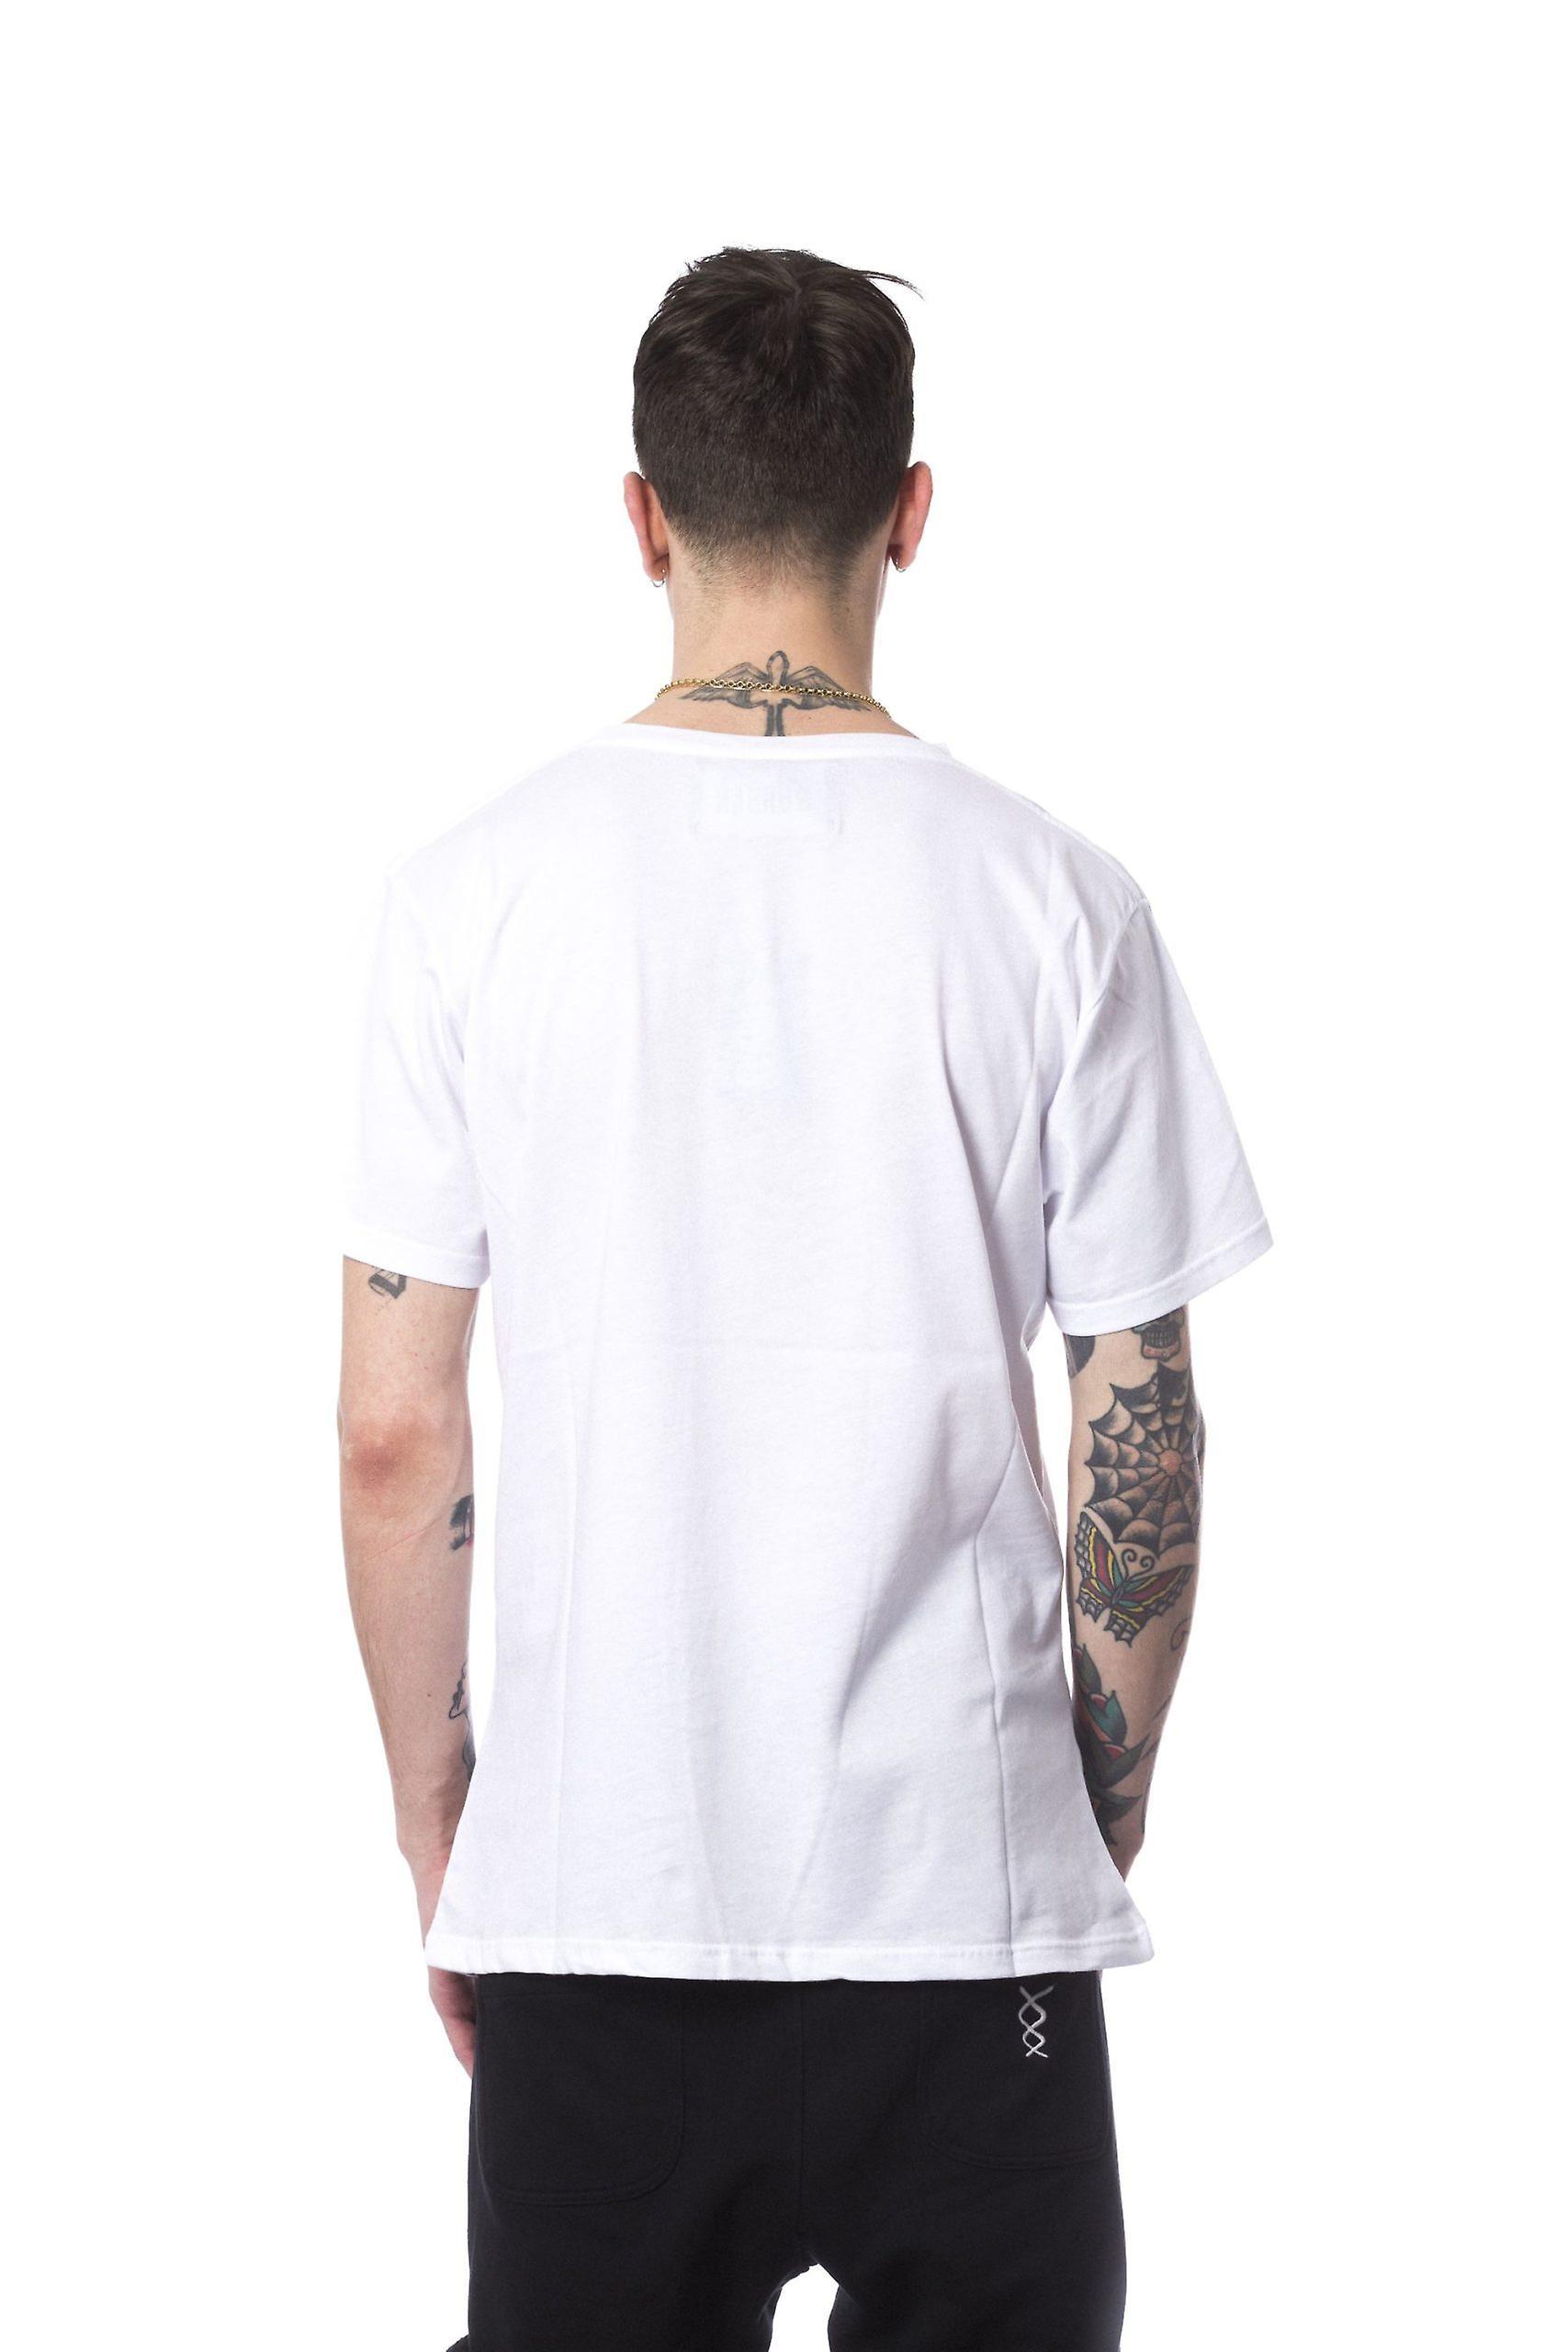 Nicolo Tonetto Bianco Vit T-shirt NI687549-M